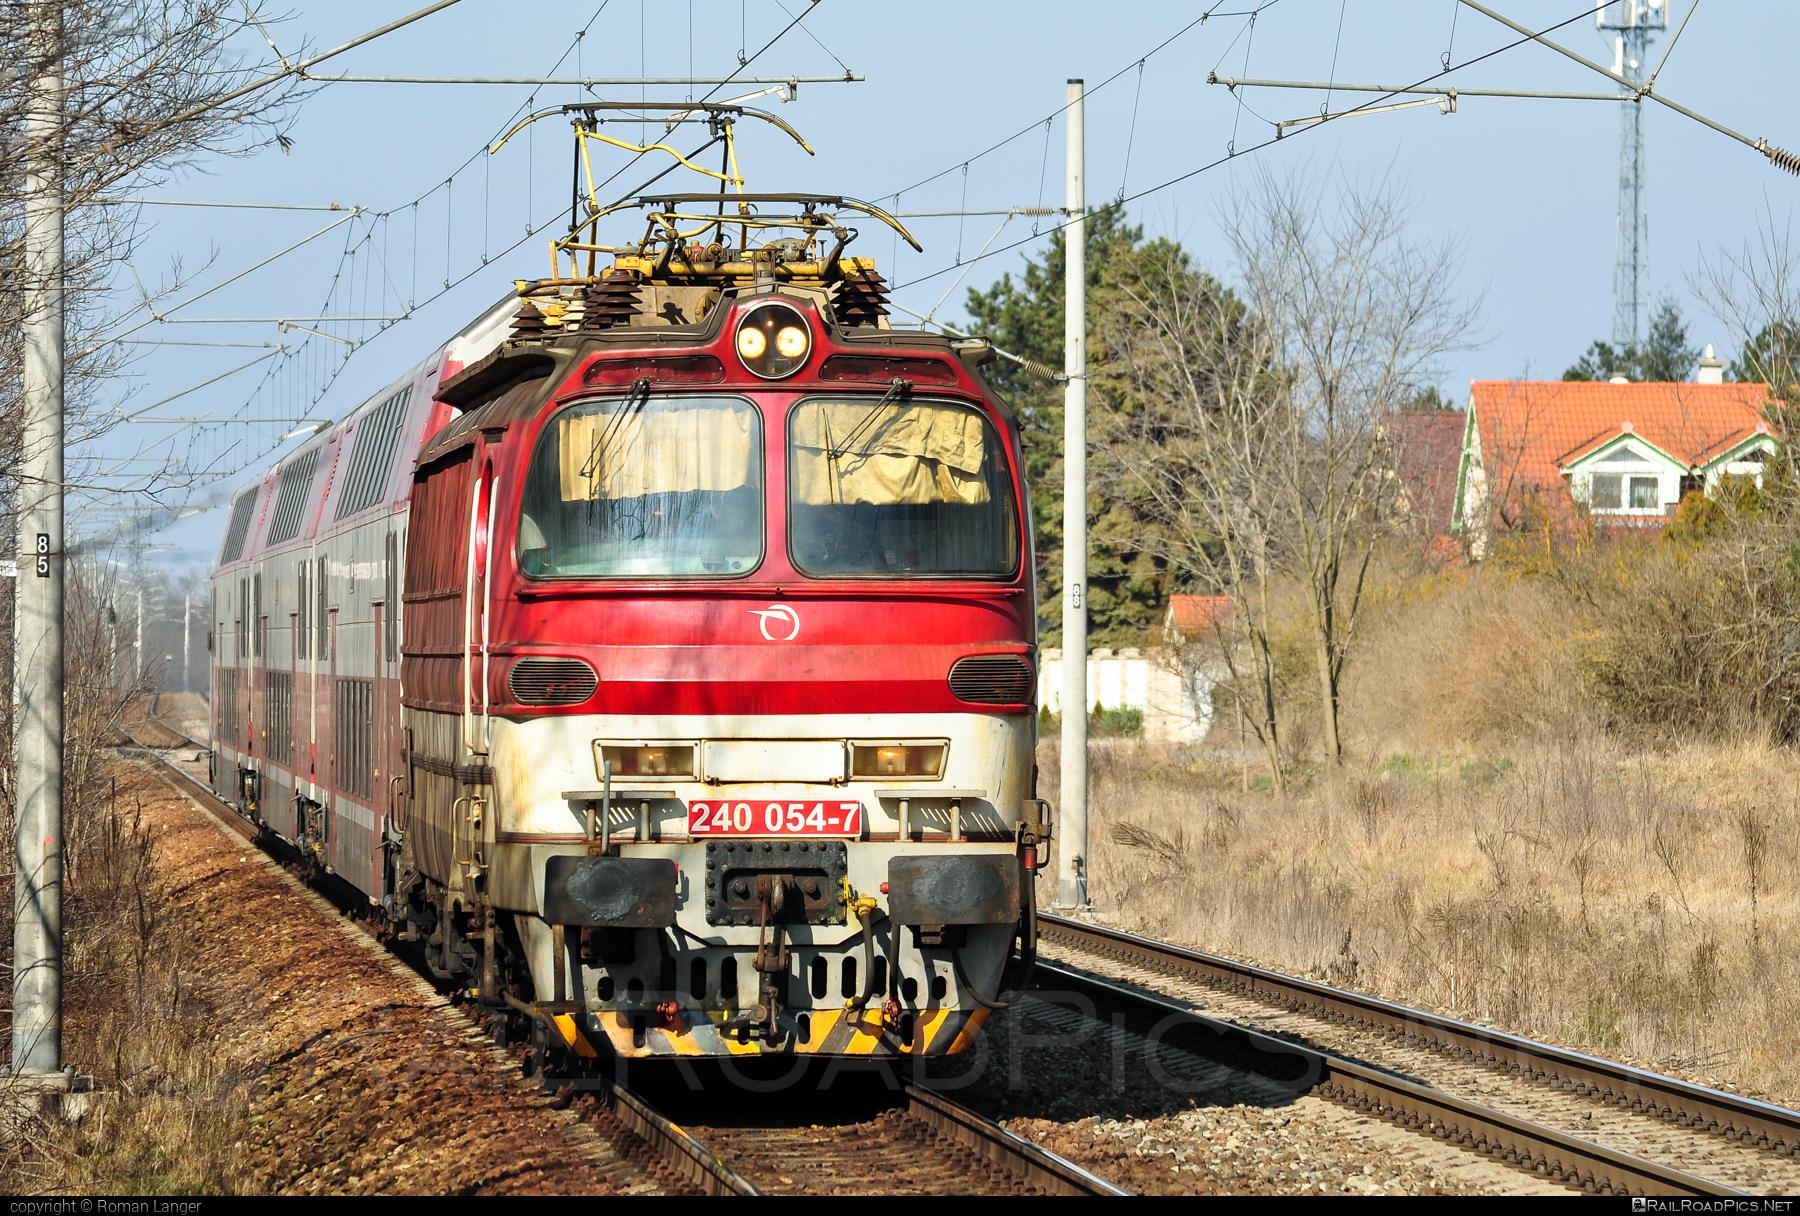 Škoda 47E - 240 054-7 operated by Železničná Spoločnost' Slovensko, a.s. #ZeleznicnaSpolocnostSlovensko #laminatka #locomotive240 #skoda #skoda47e #zssk